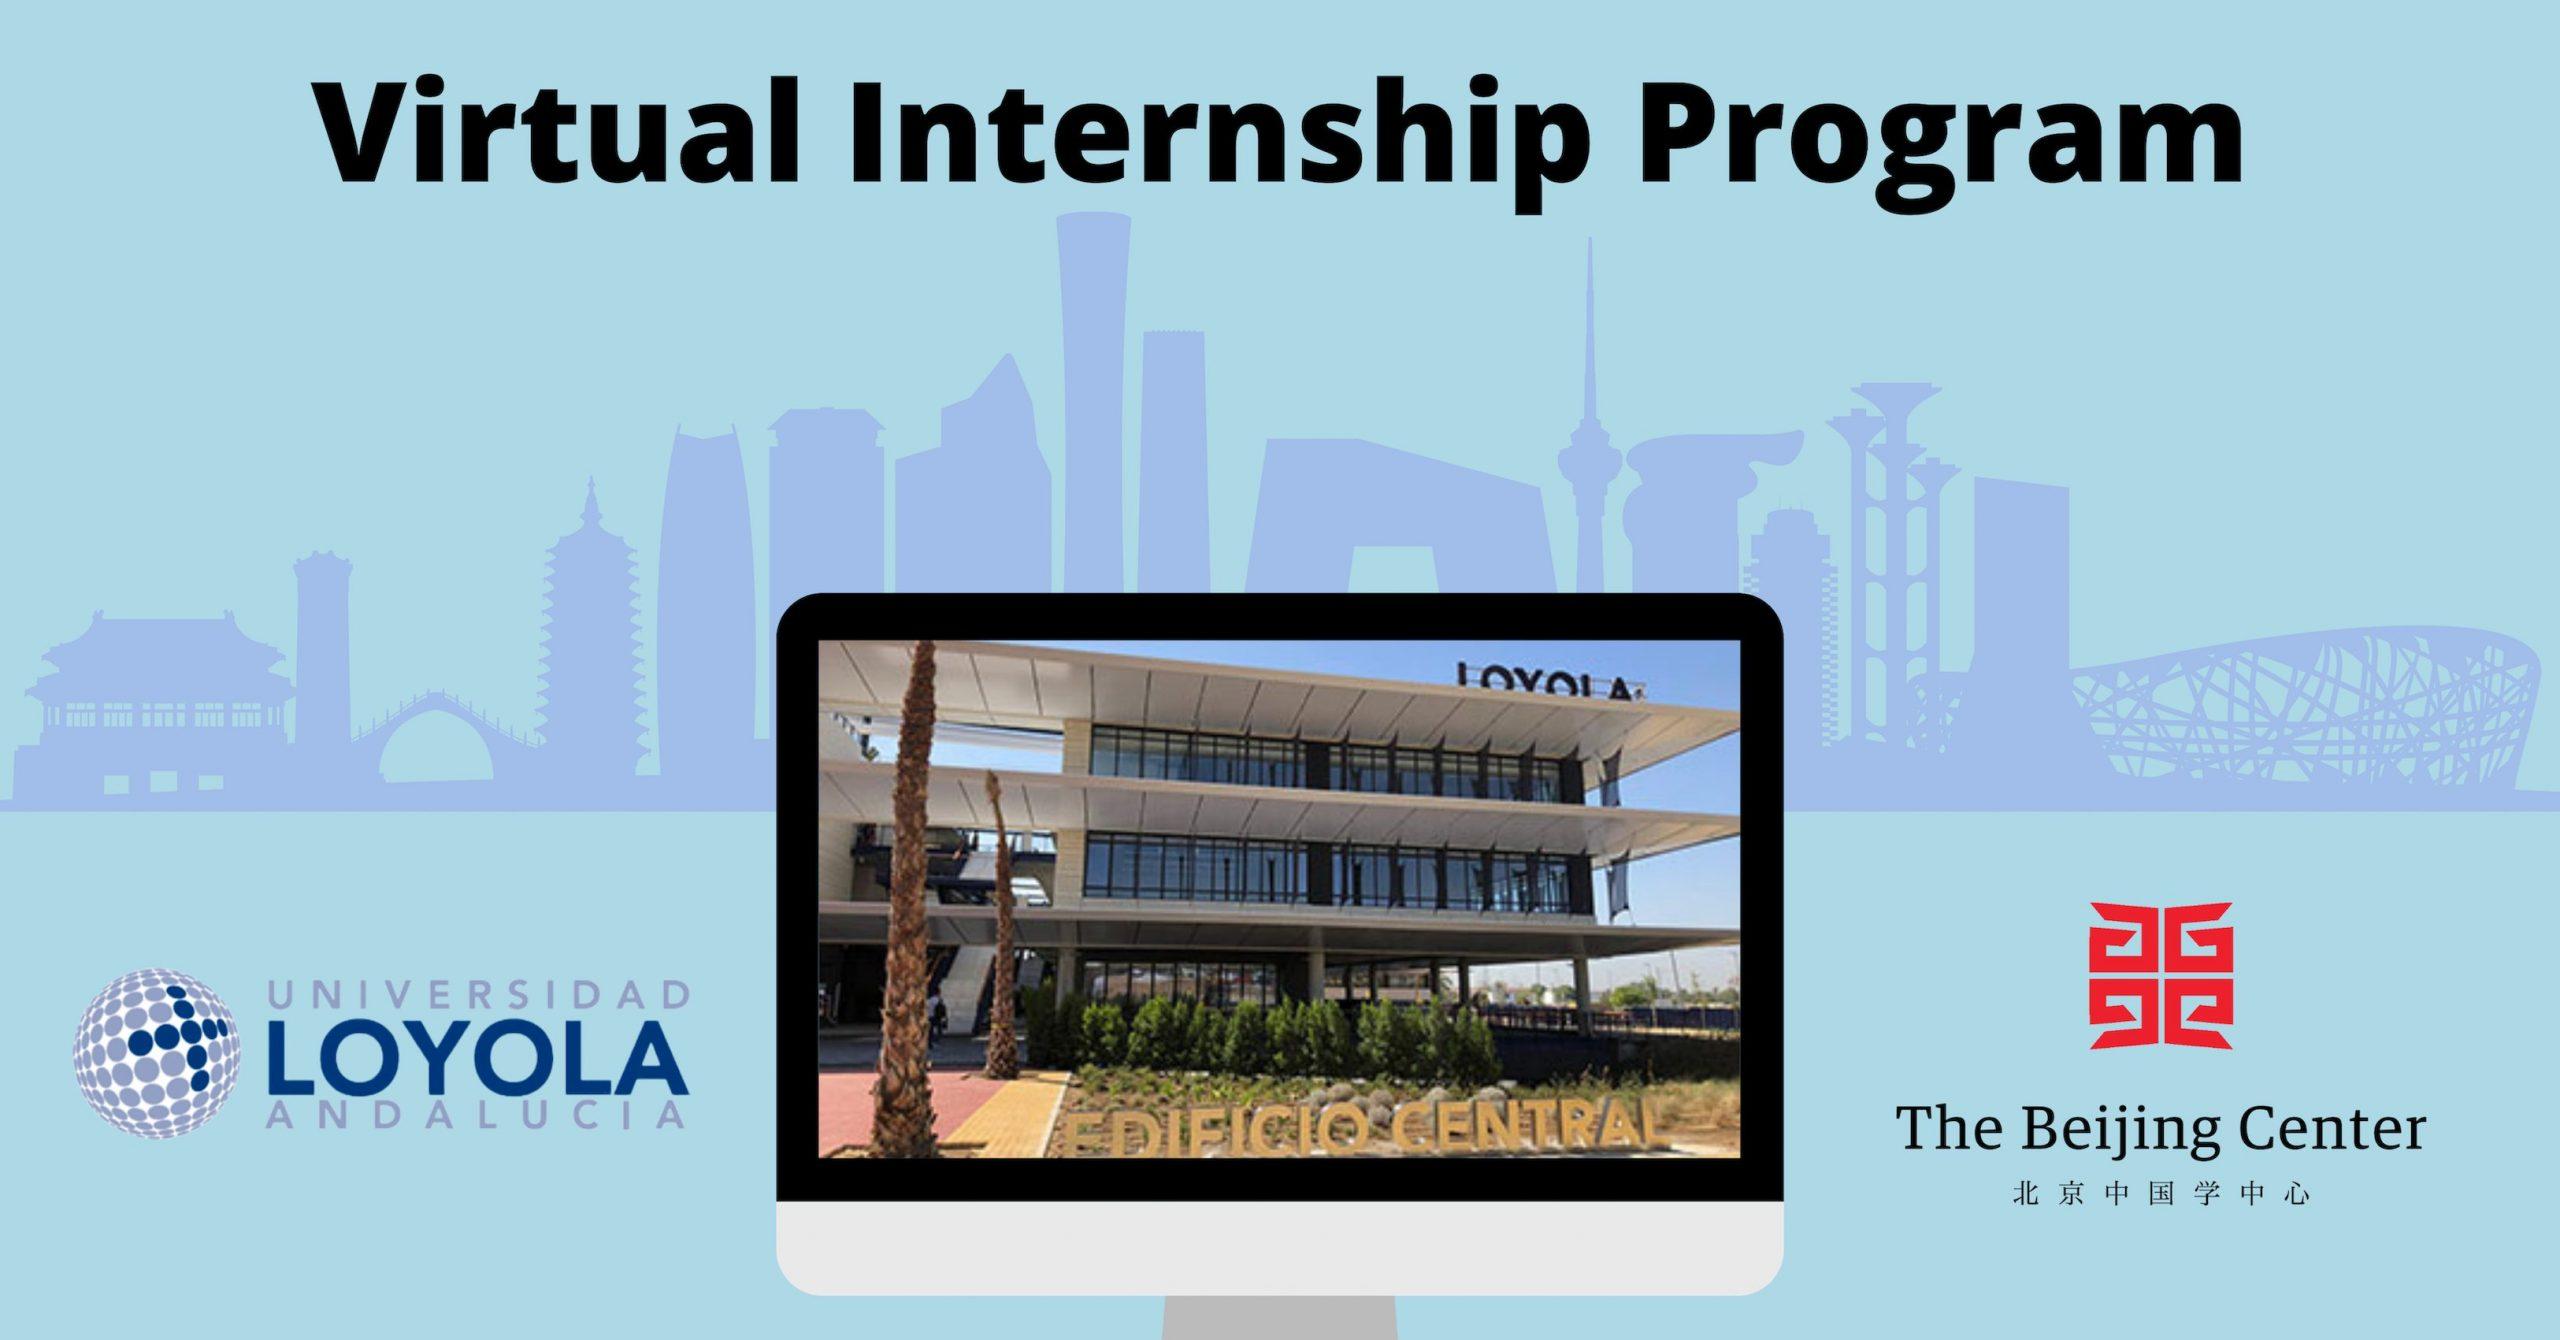 Loyola University Andalucía and The Beijing Center Sign A Virtual Internship Agreement